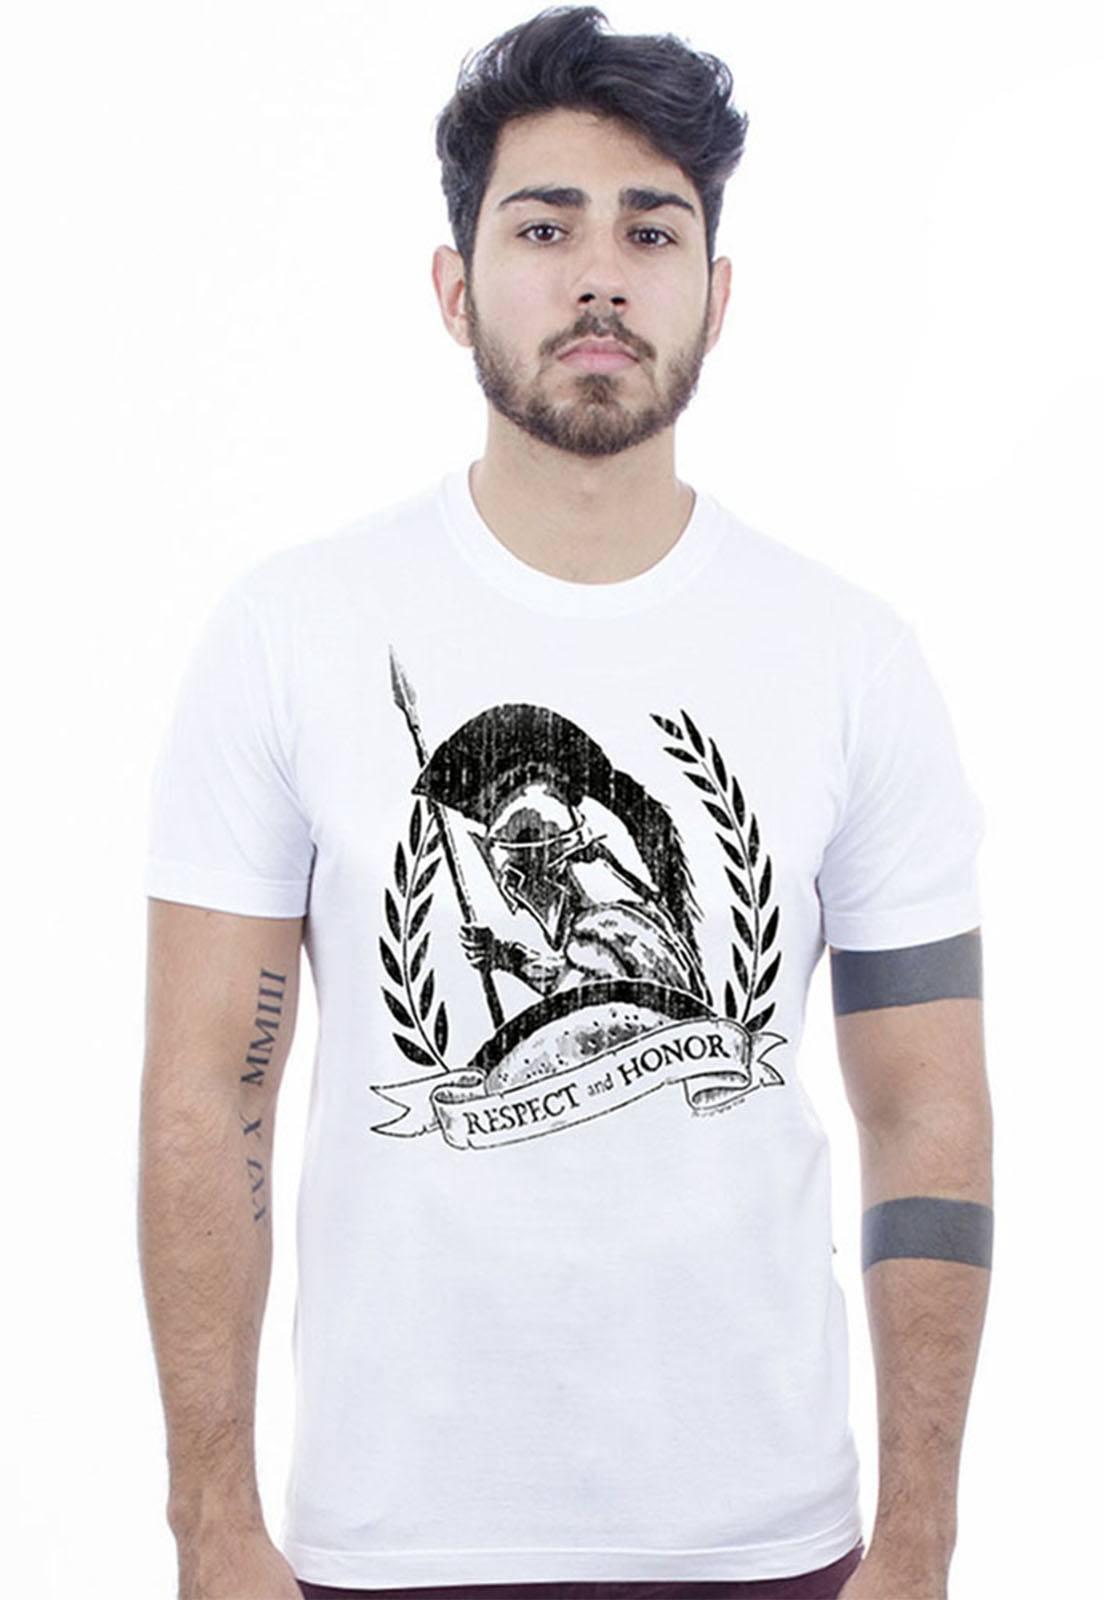 Camiseta masculina branca Esparta - 100% algodão - Hardivision